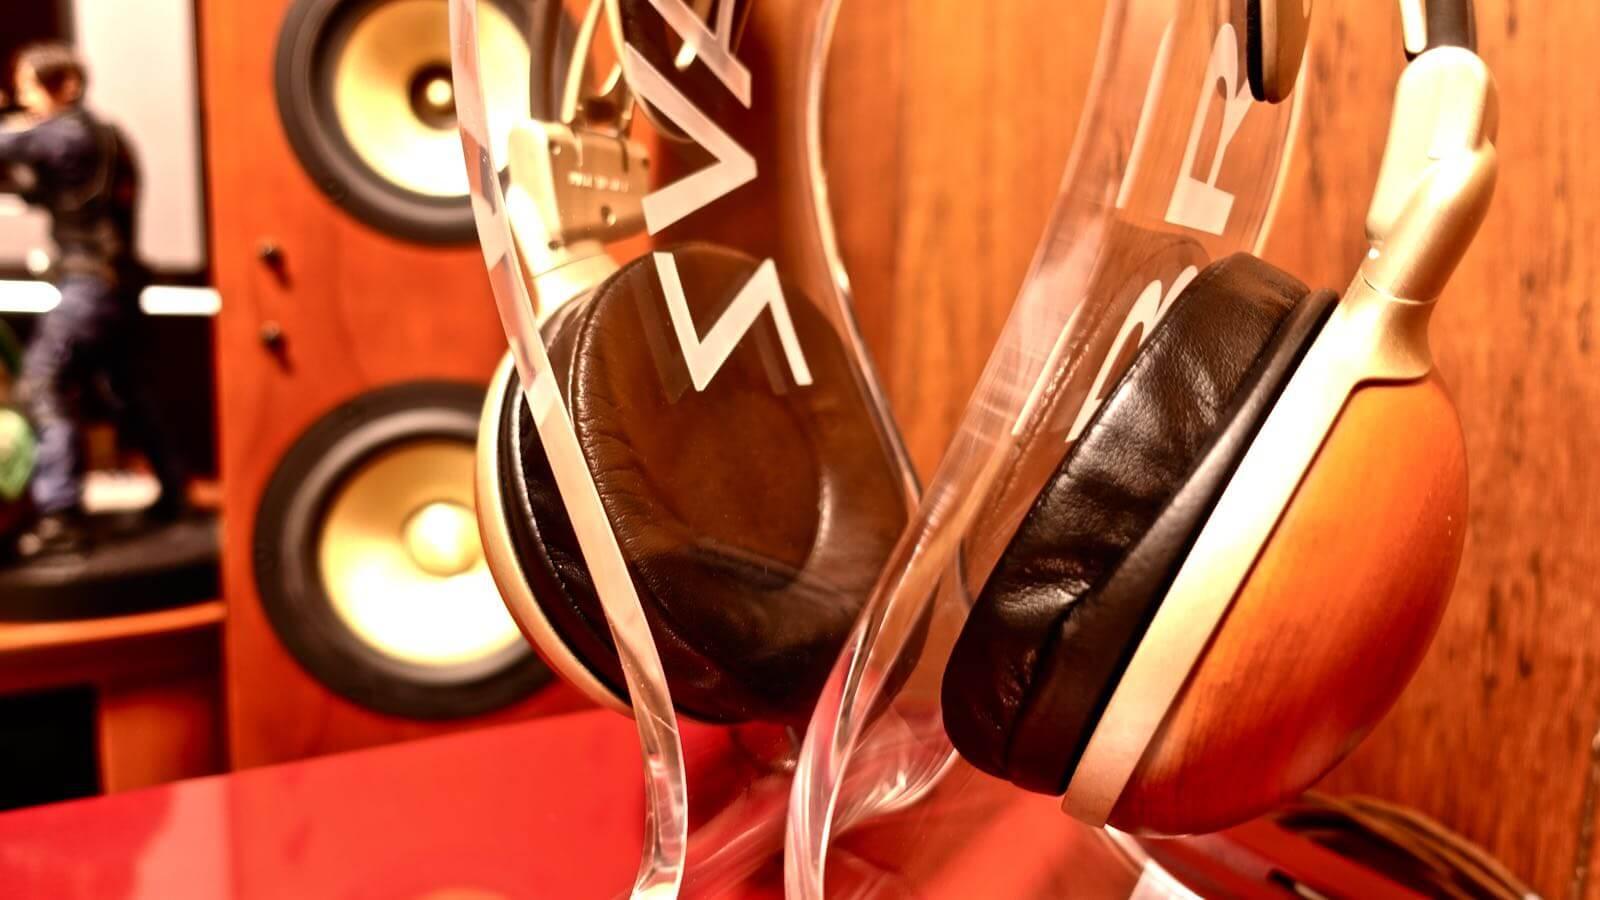 0080 OMEGA type headphone stand BRAINWAVZ review 10